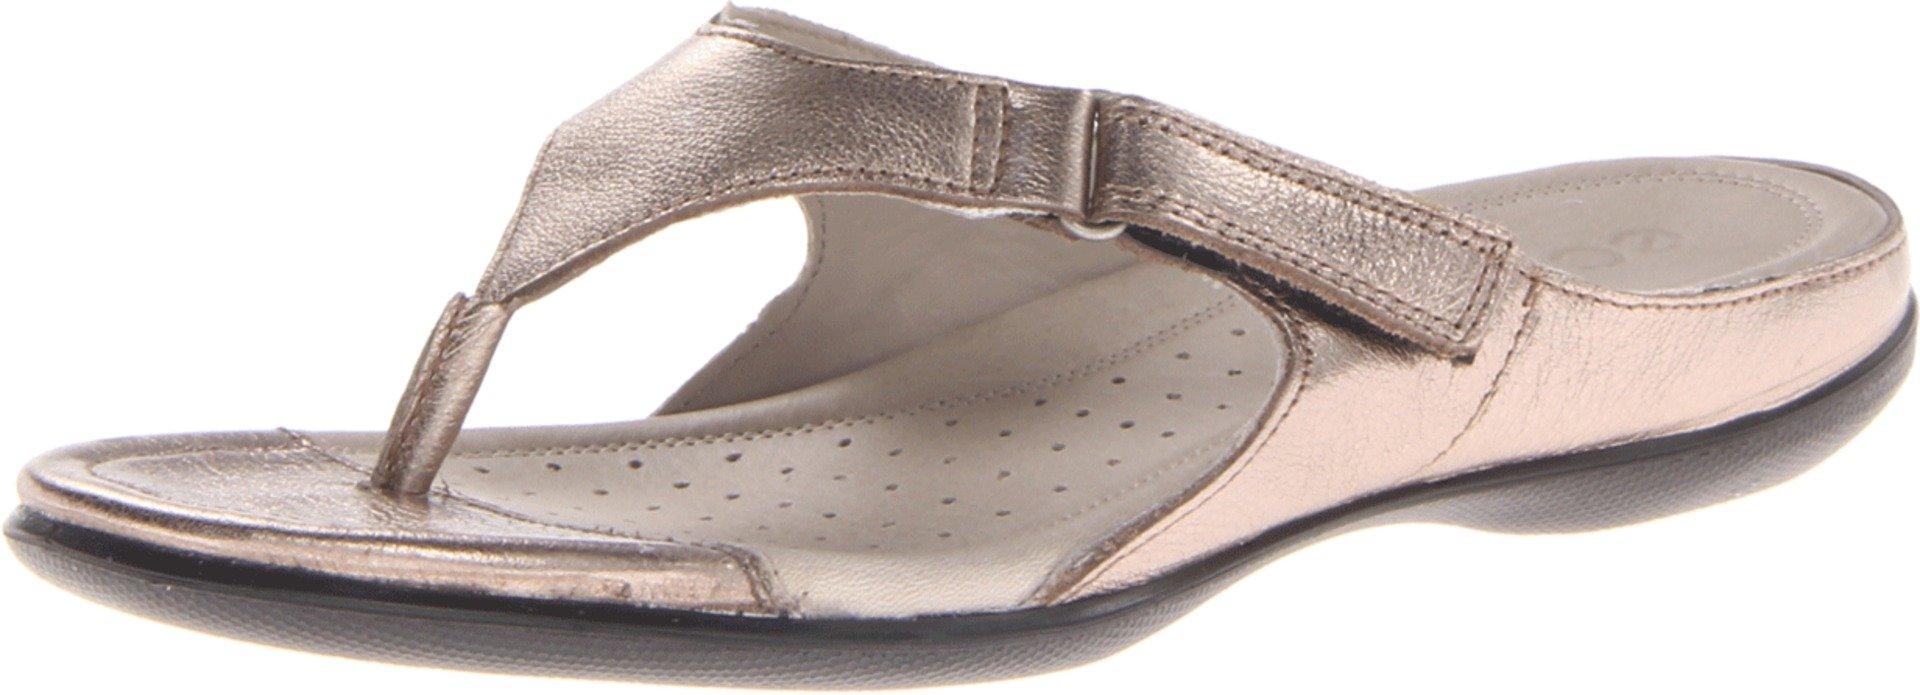 ECCO Women's Flash Thong Dress Sandal,Warm Grey Metallic,39 EU/8-8.5 M US